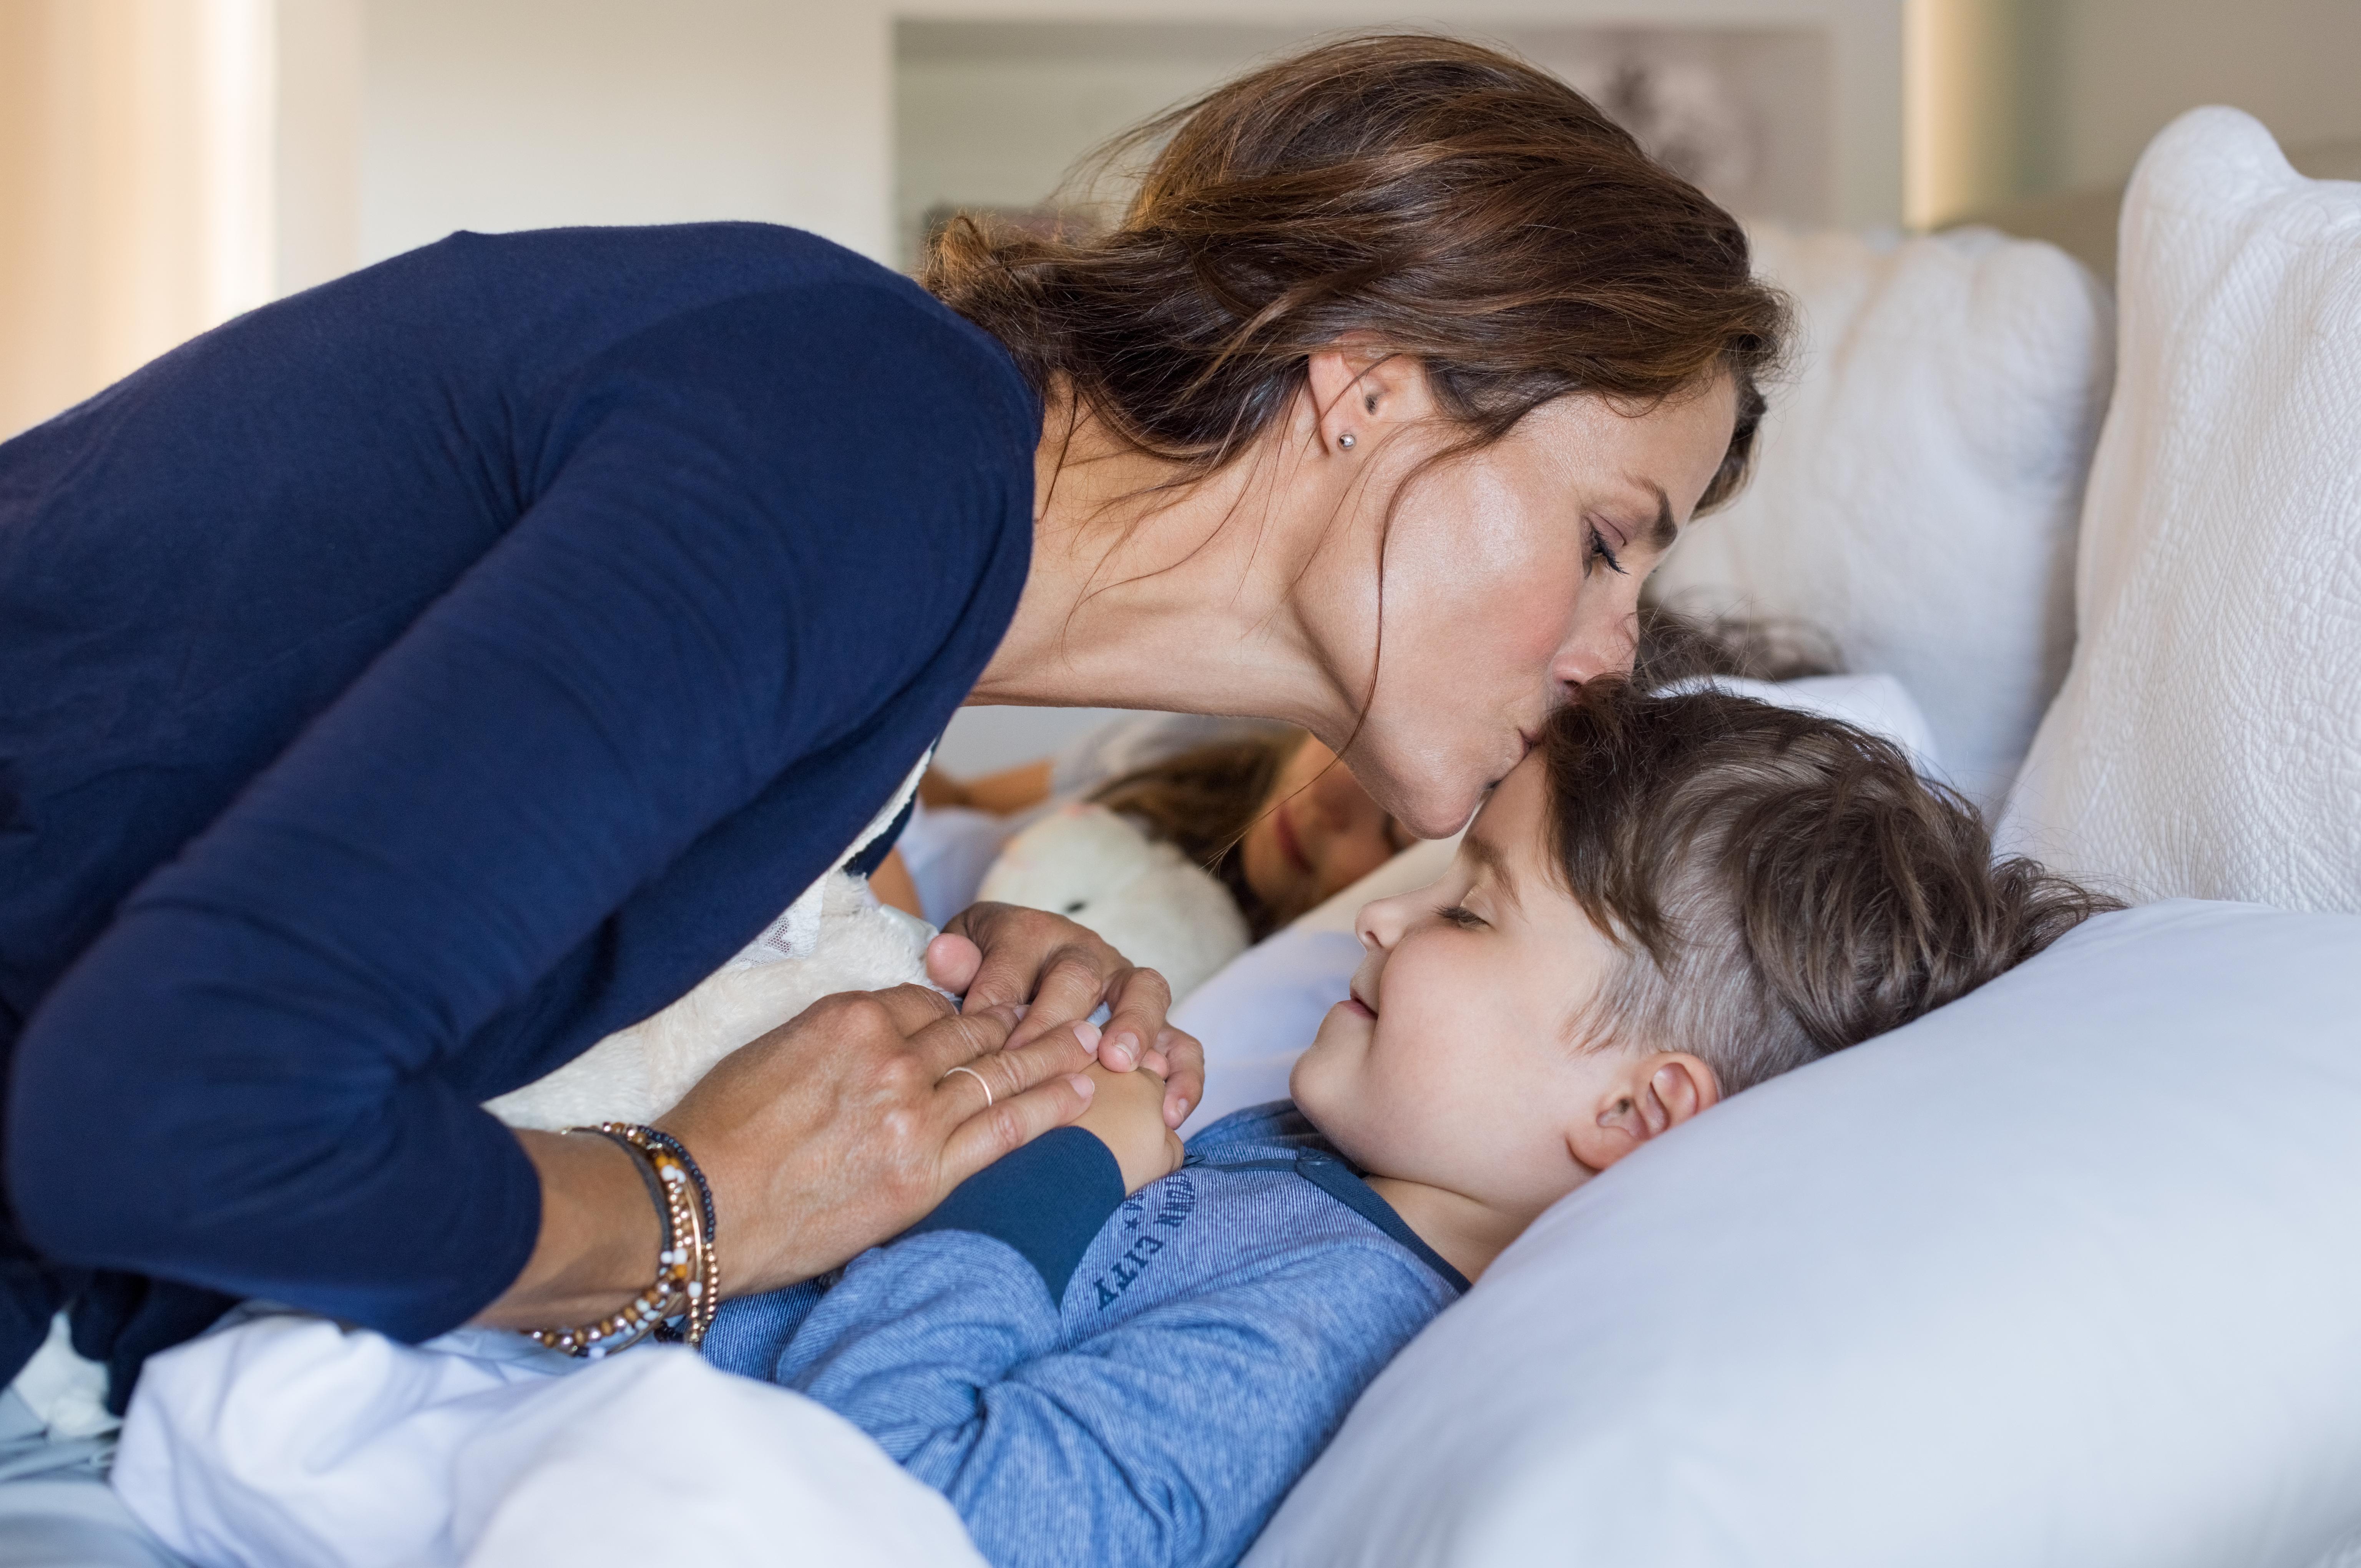 Back to school sleep schedules Chiropractic care in Denver Colorado with Dr. Lauren Love Healthy living in Denver Colorado